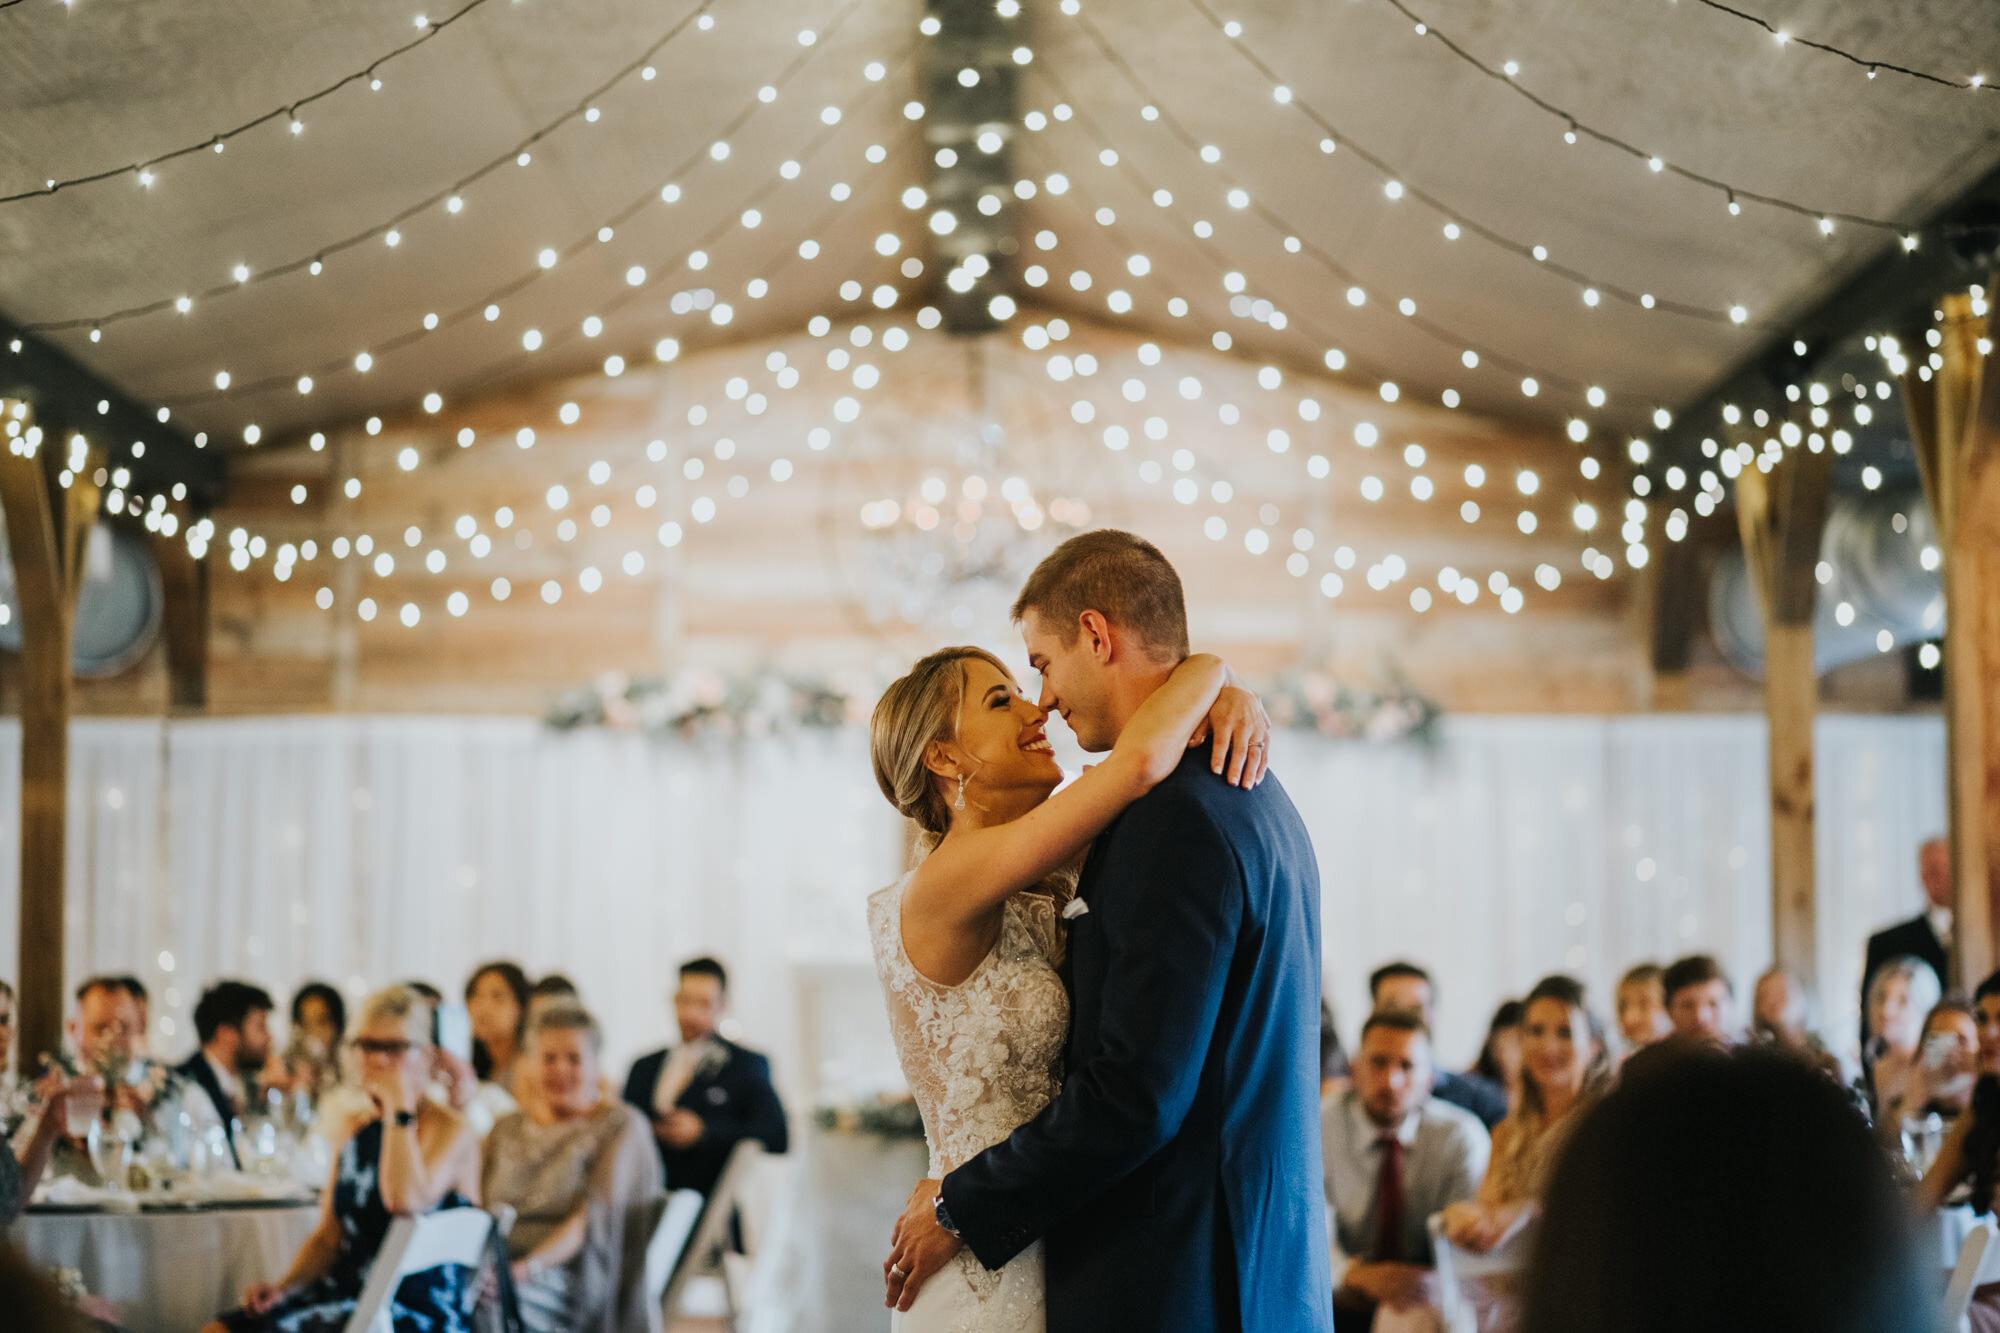 445Sean_Emily_Wedding_3-30-19.jpg